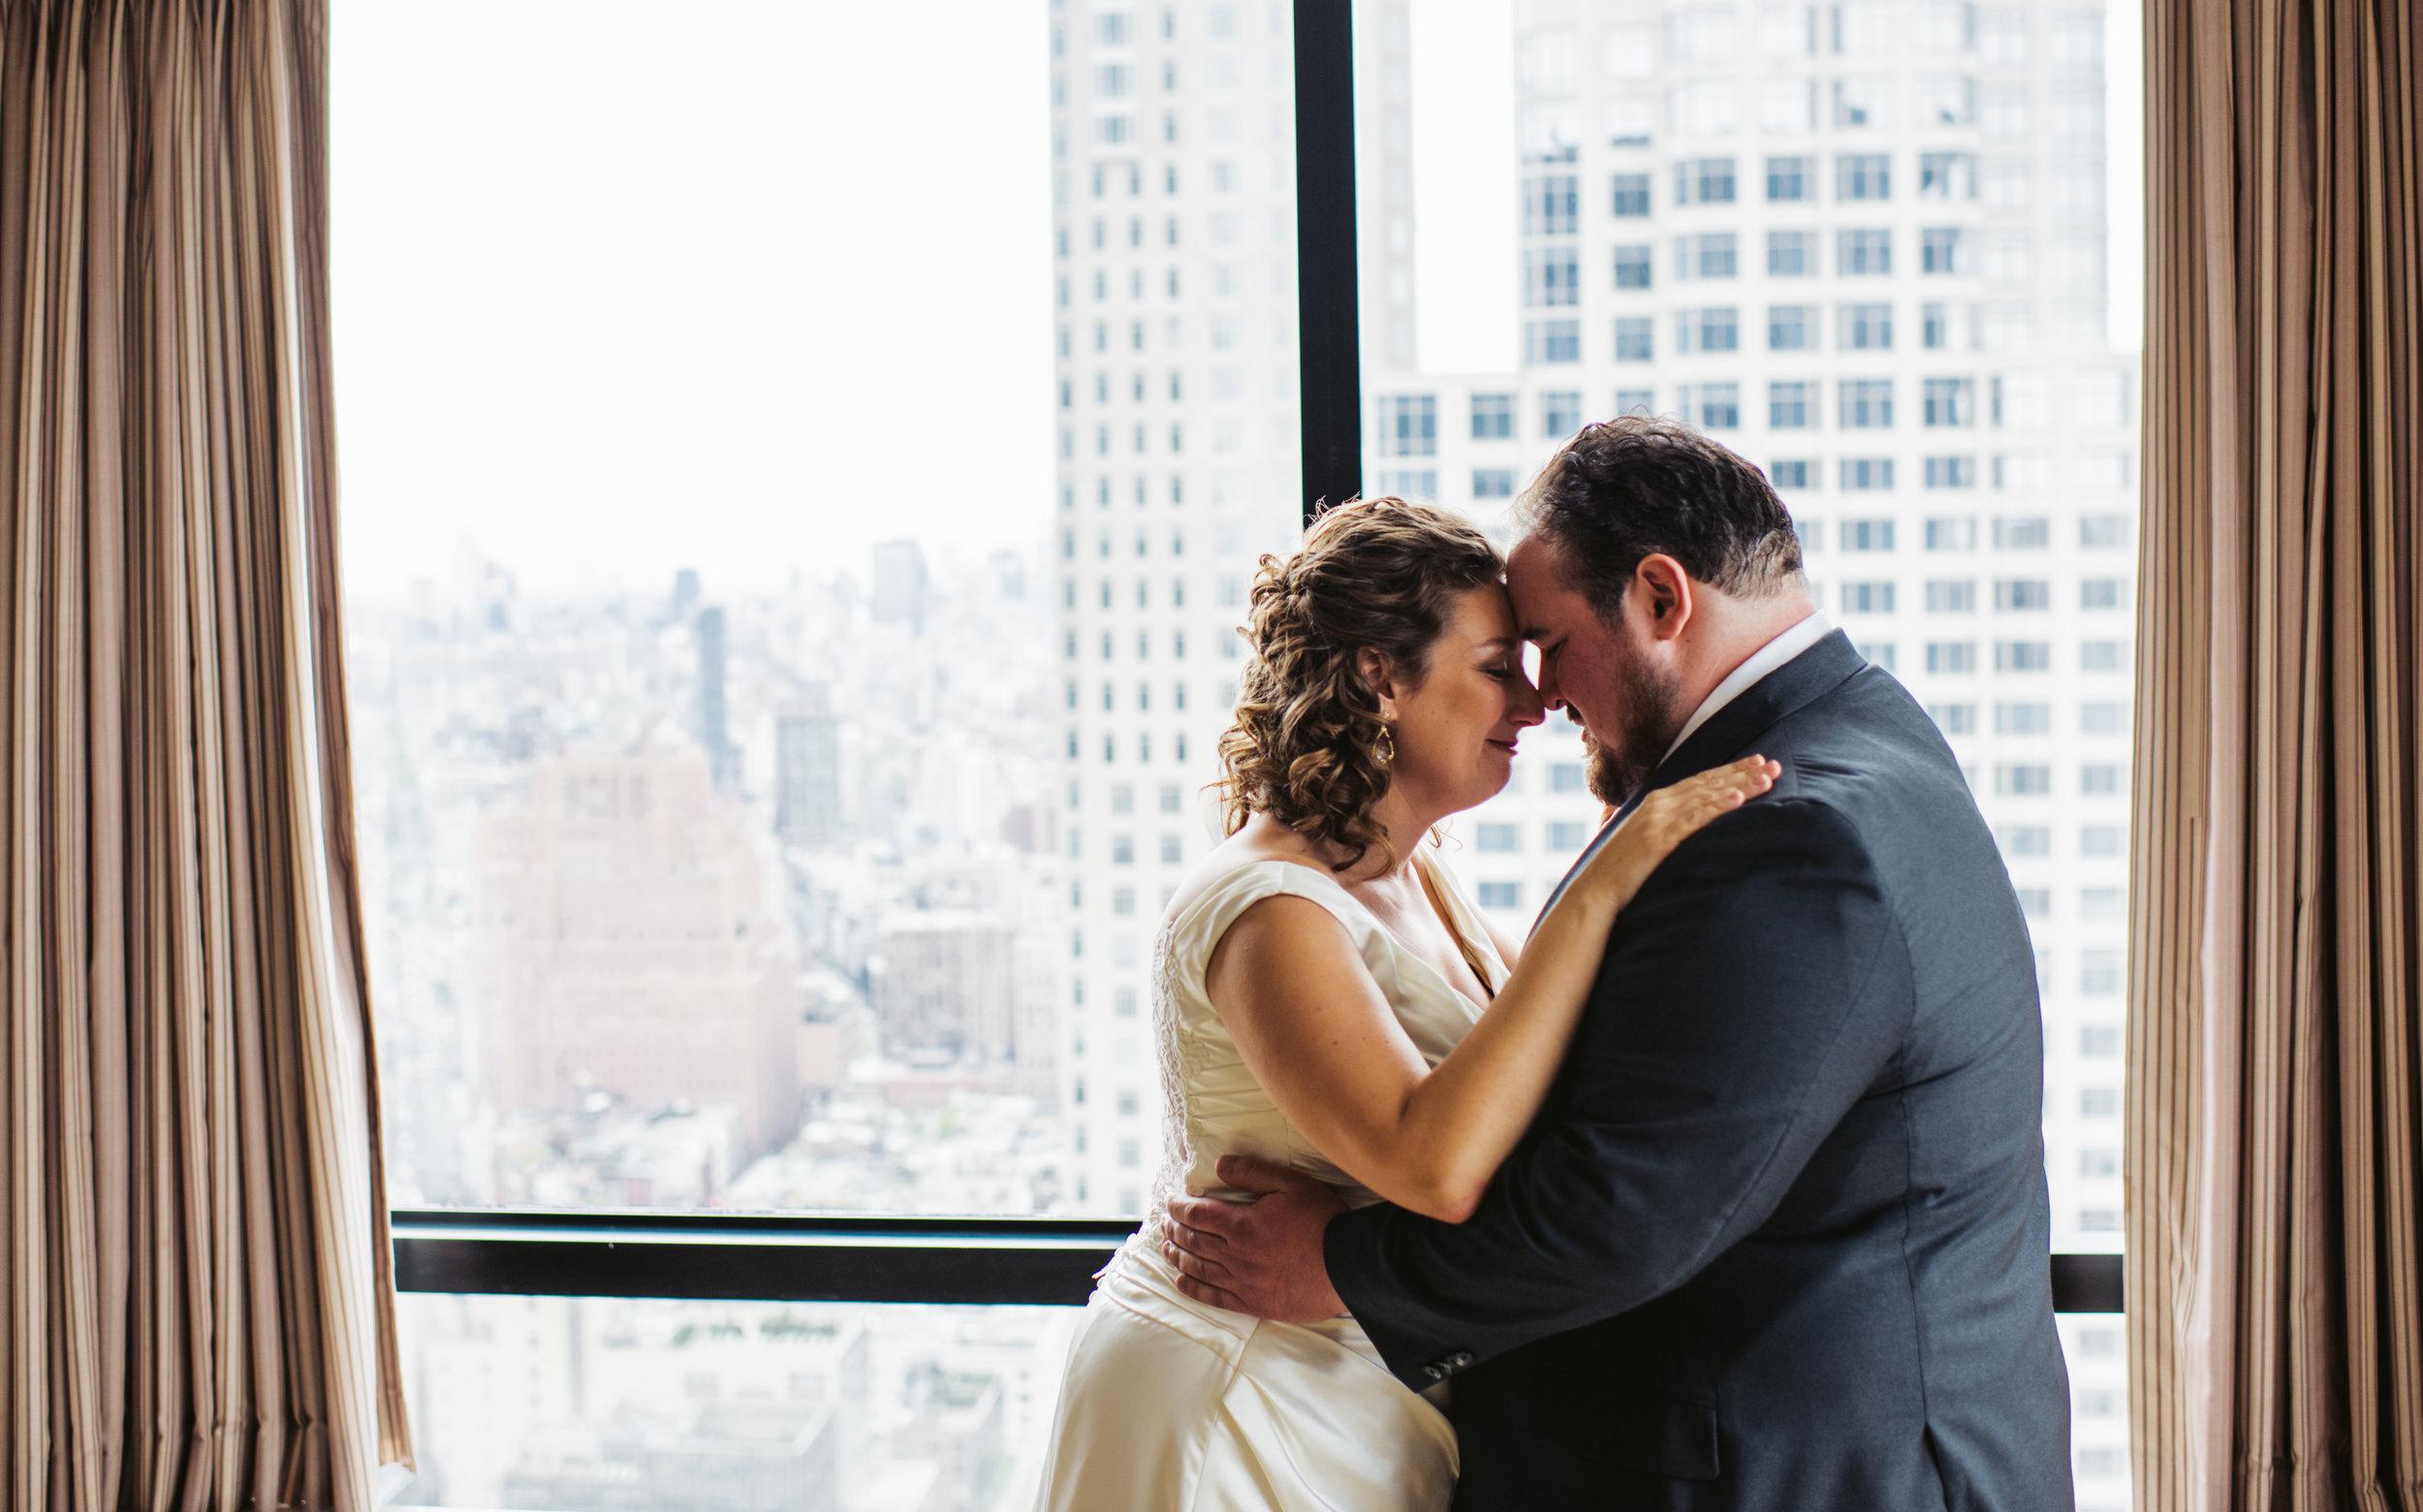 LIZA & JON - BATTERY PARK WEDDING - NYC INTIMATE WEDDING PHOTOGRAPHER - CHI-CHI AGBIM-128.jpg